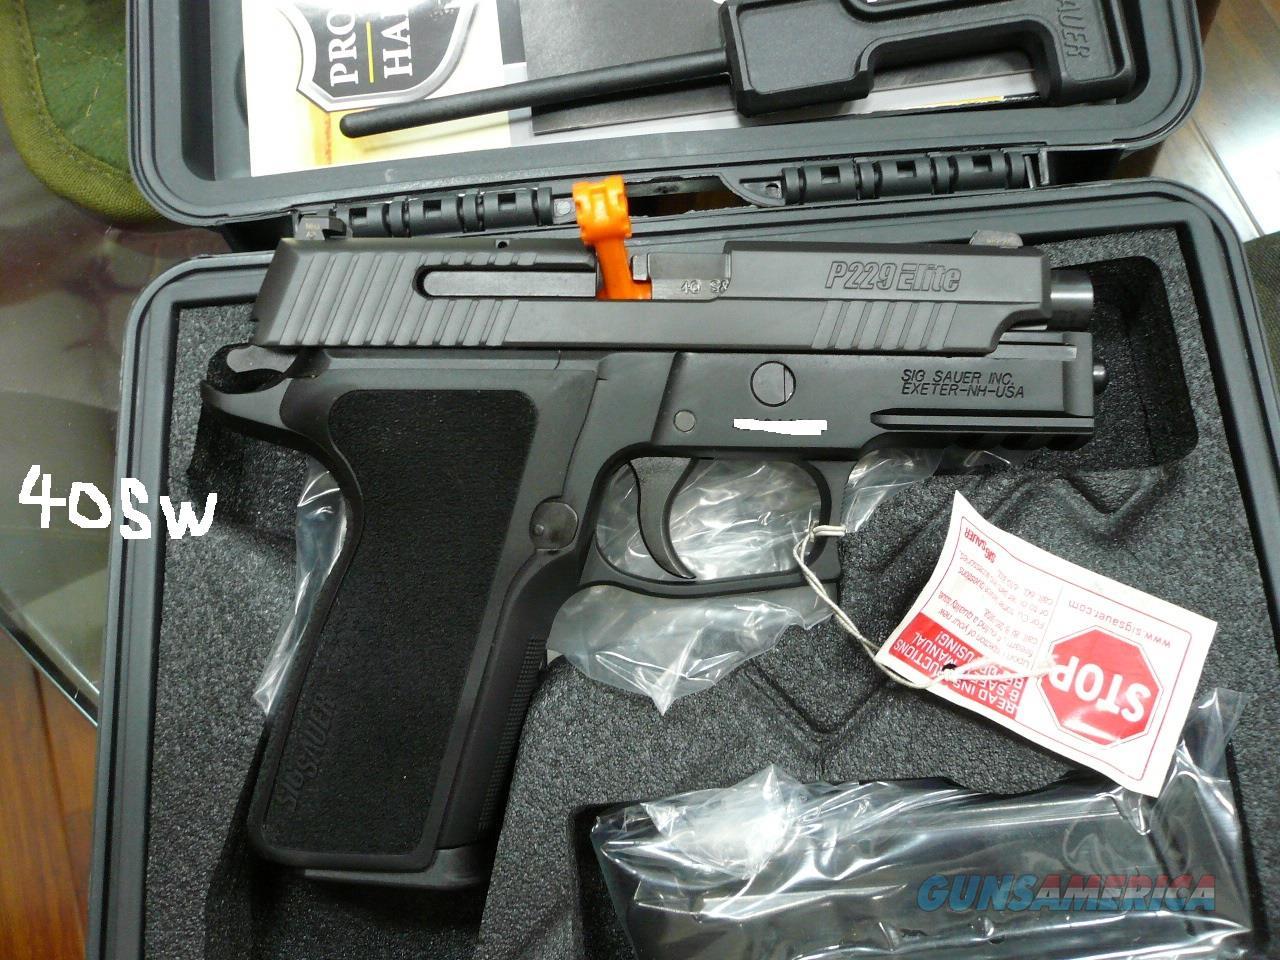 P229R-ELITE 40SW NIB  Guns > Pistols > Sig - Sauer/Sigarms Pistols > P229